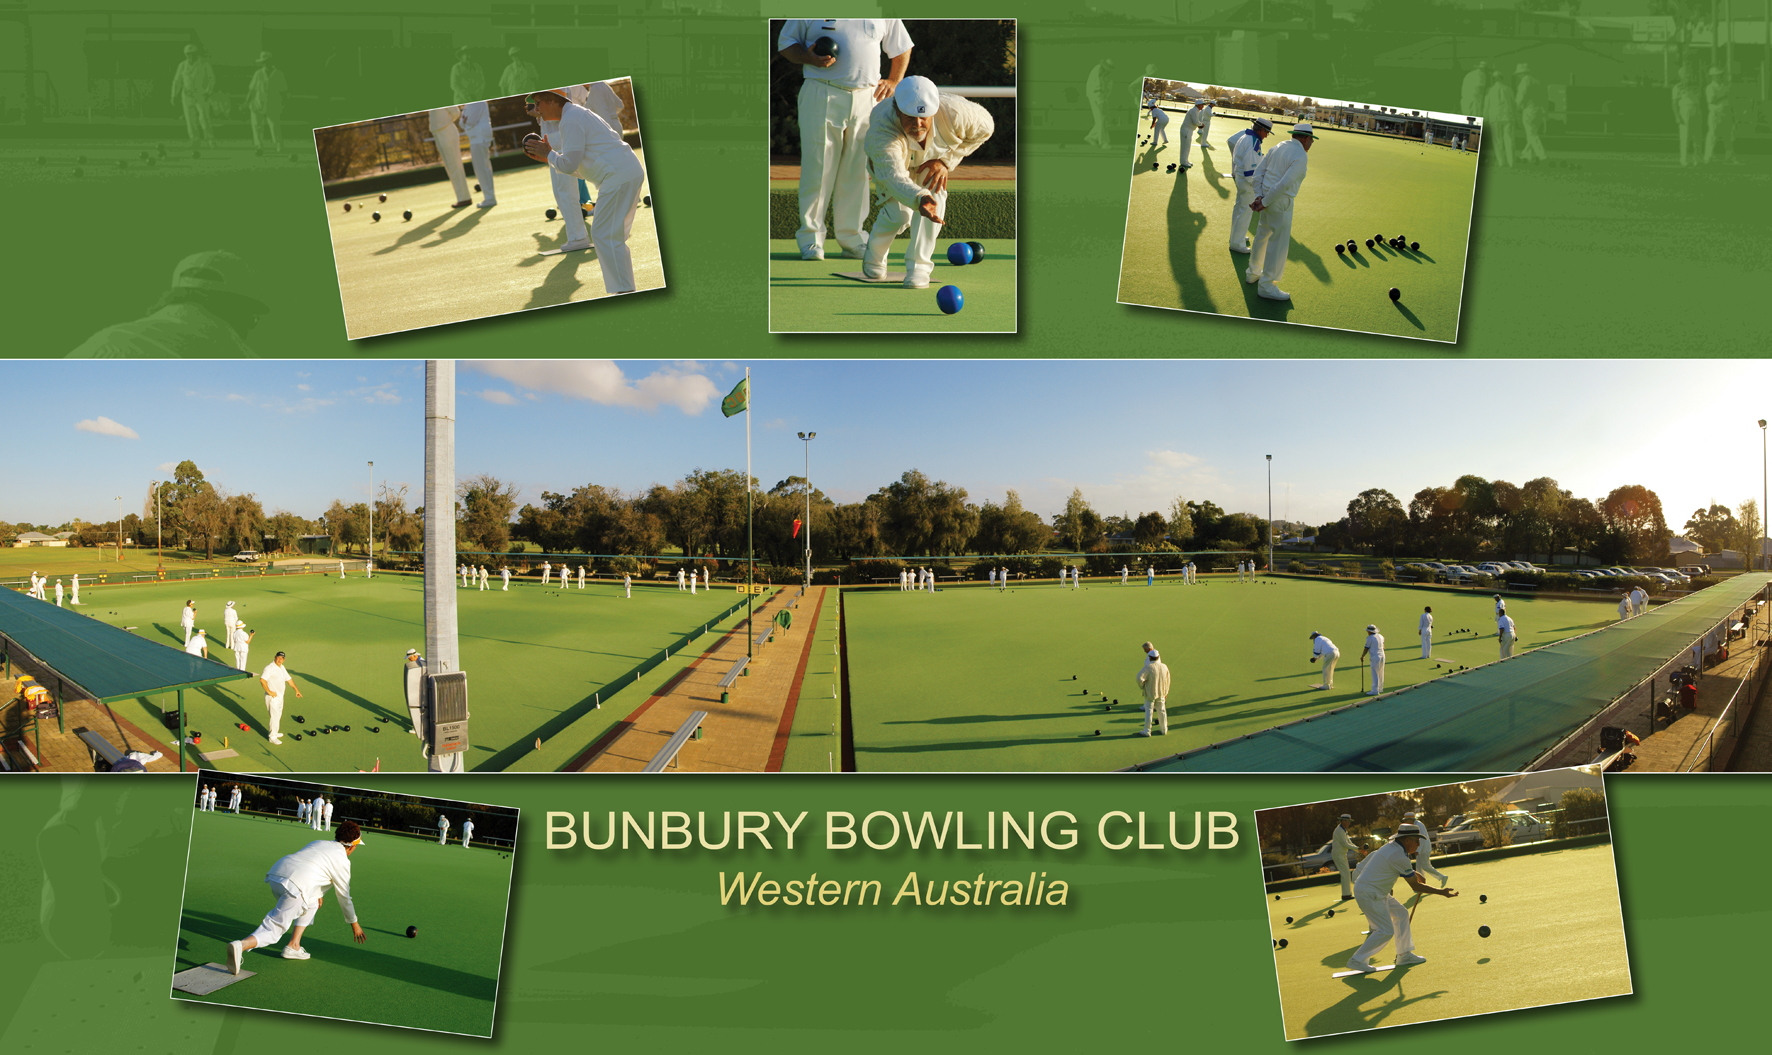 Bunbury Bowling Club (WA)